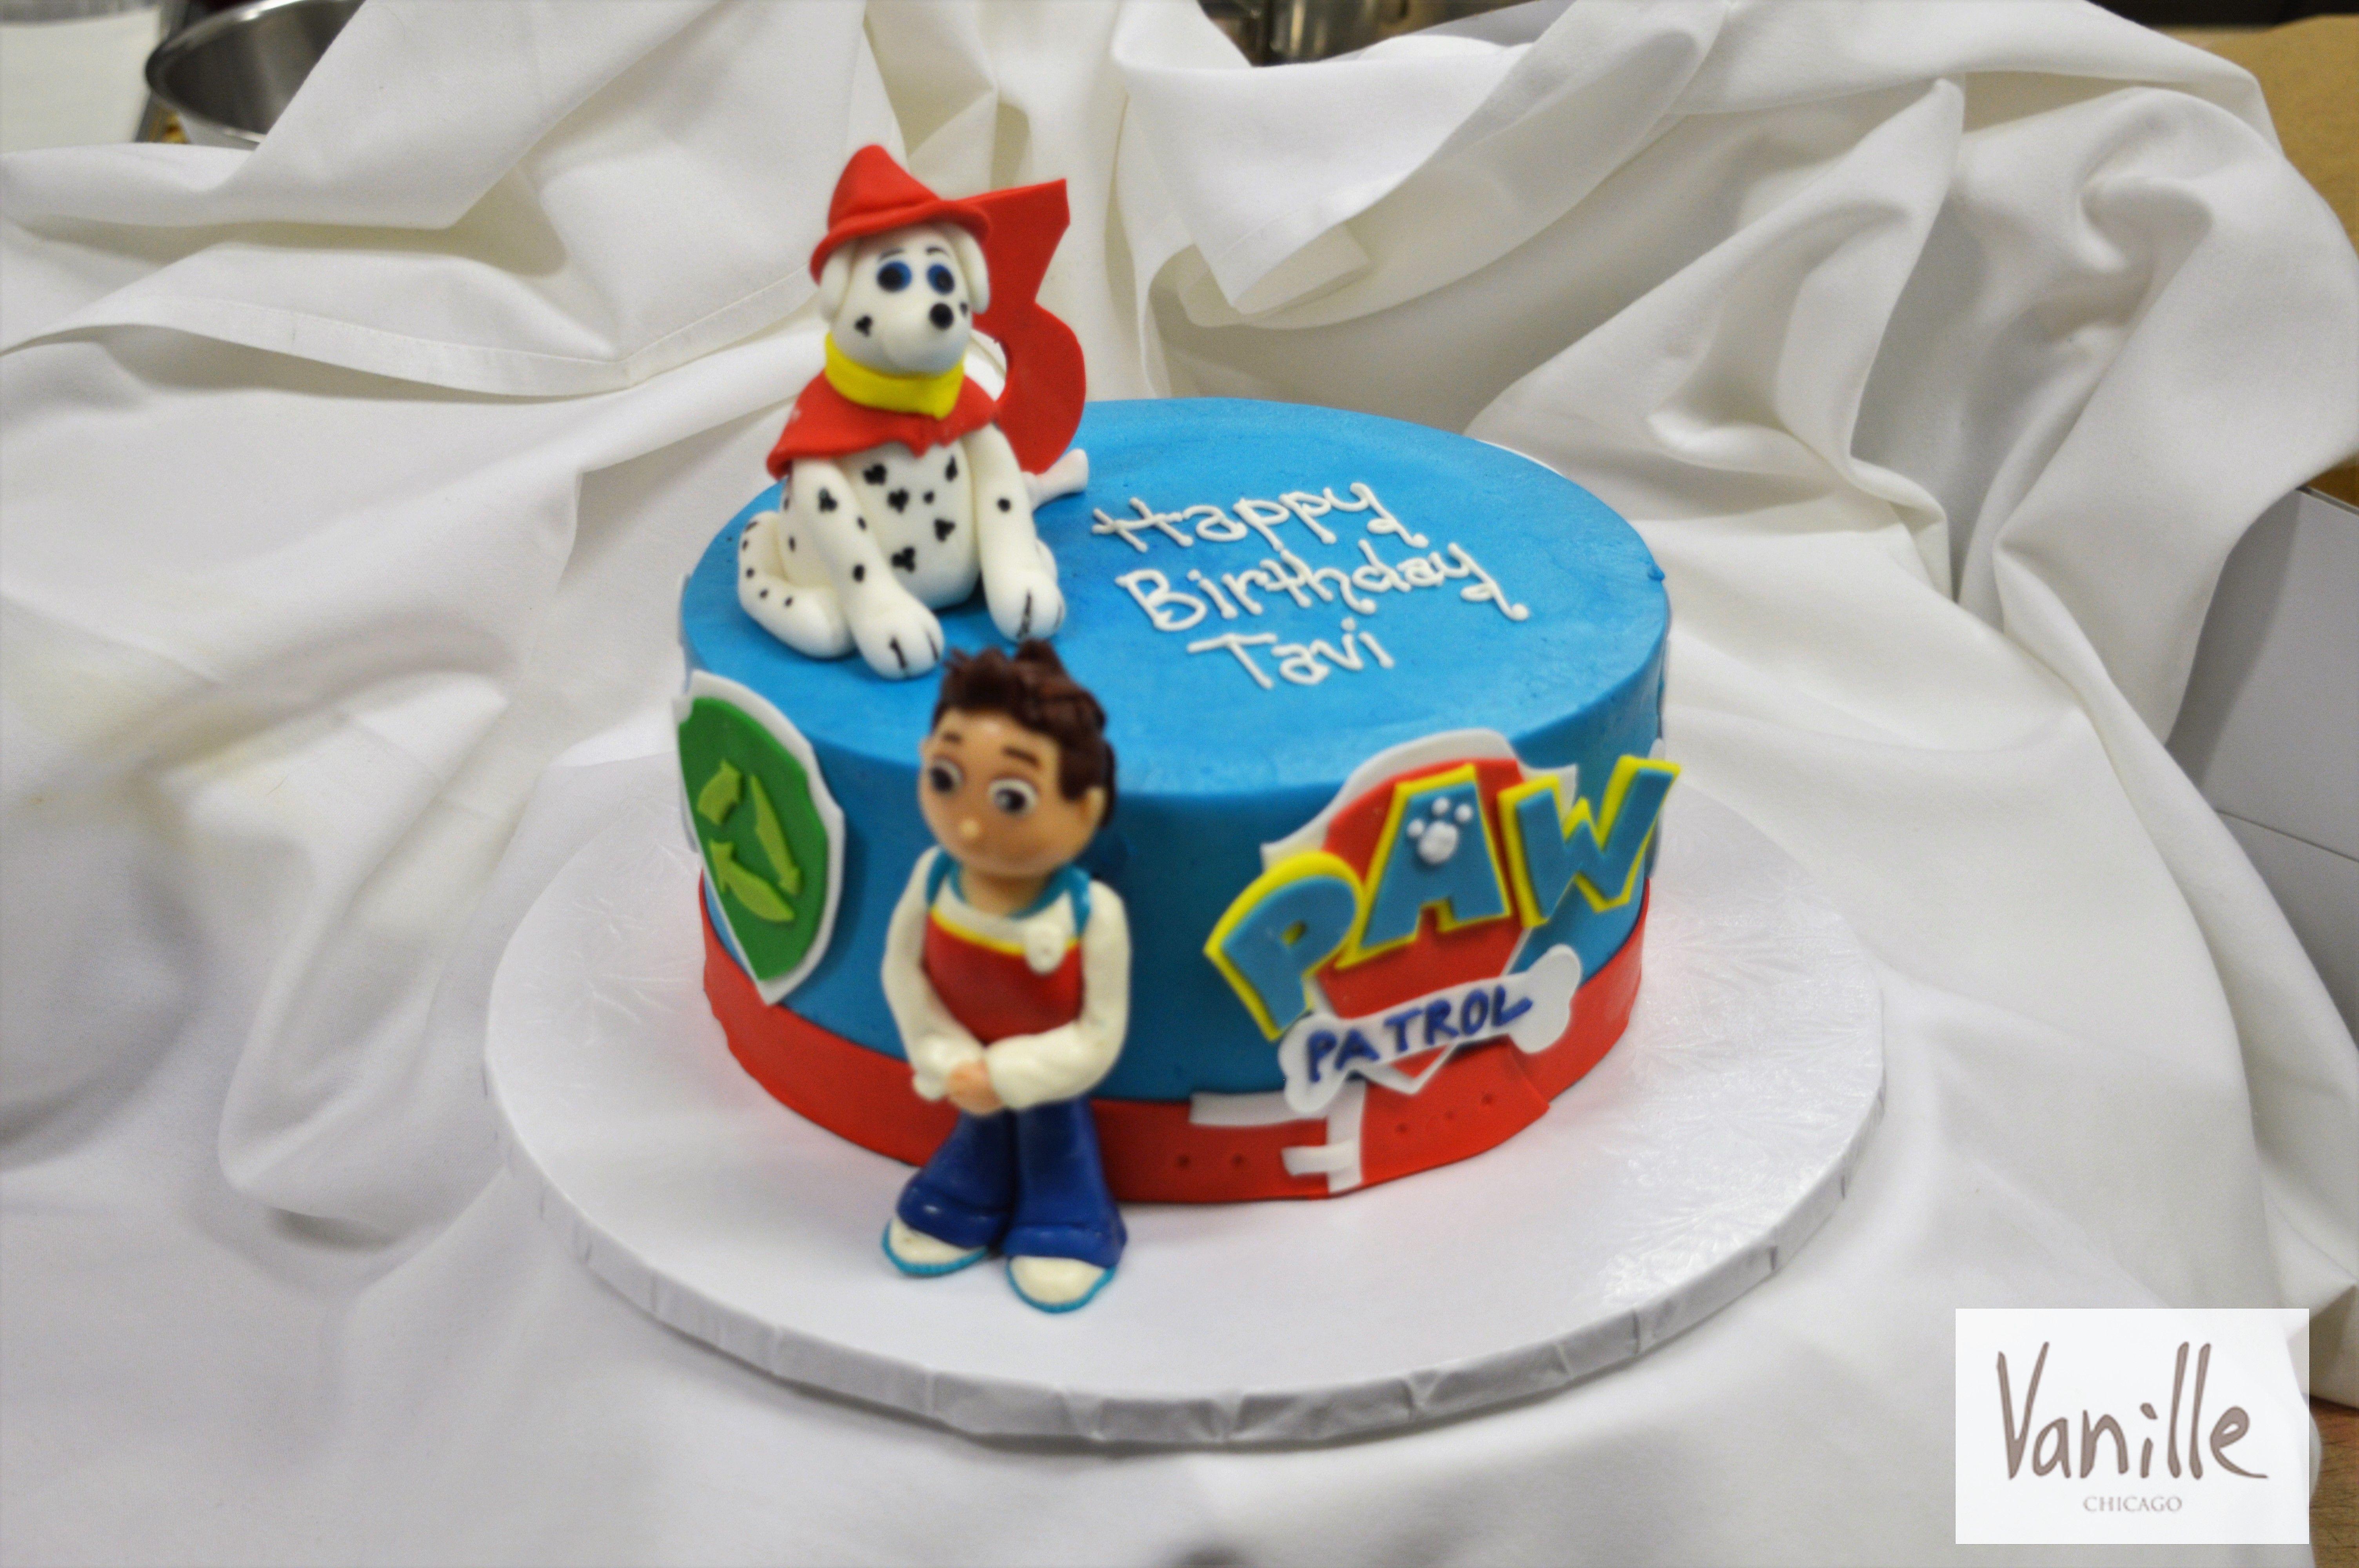 Tremendous Vanille Chicago Paw Patrol Birthday Cake Vck38 Paw Patrol Funny Birthday Cards Online Hendilapandamsfinfo